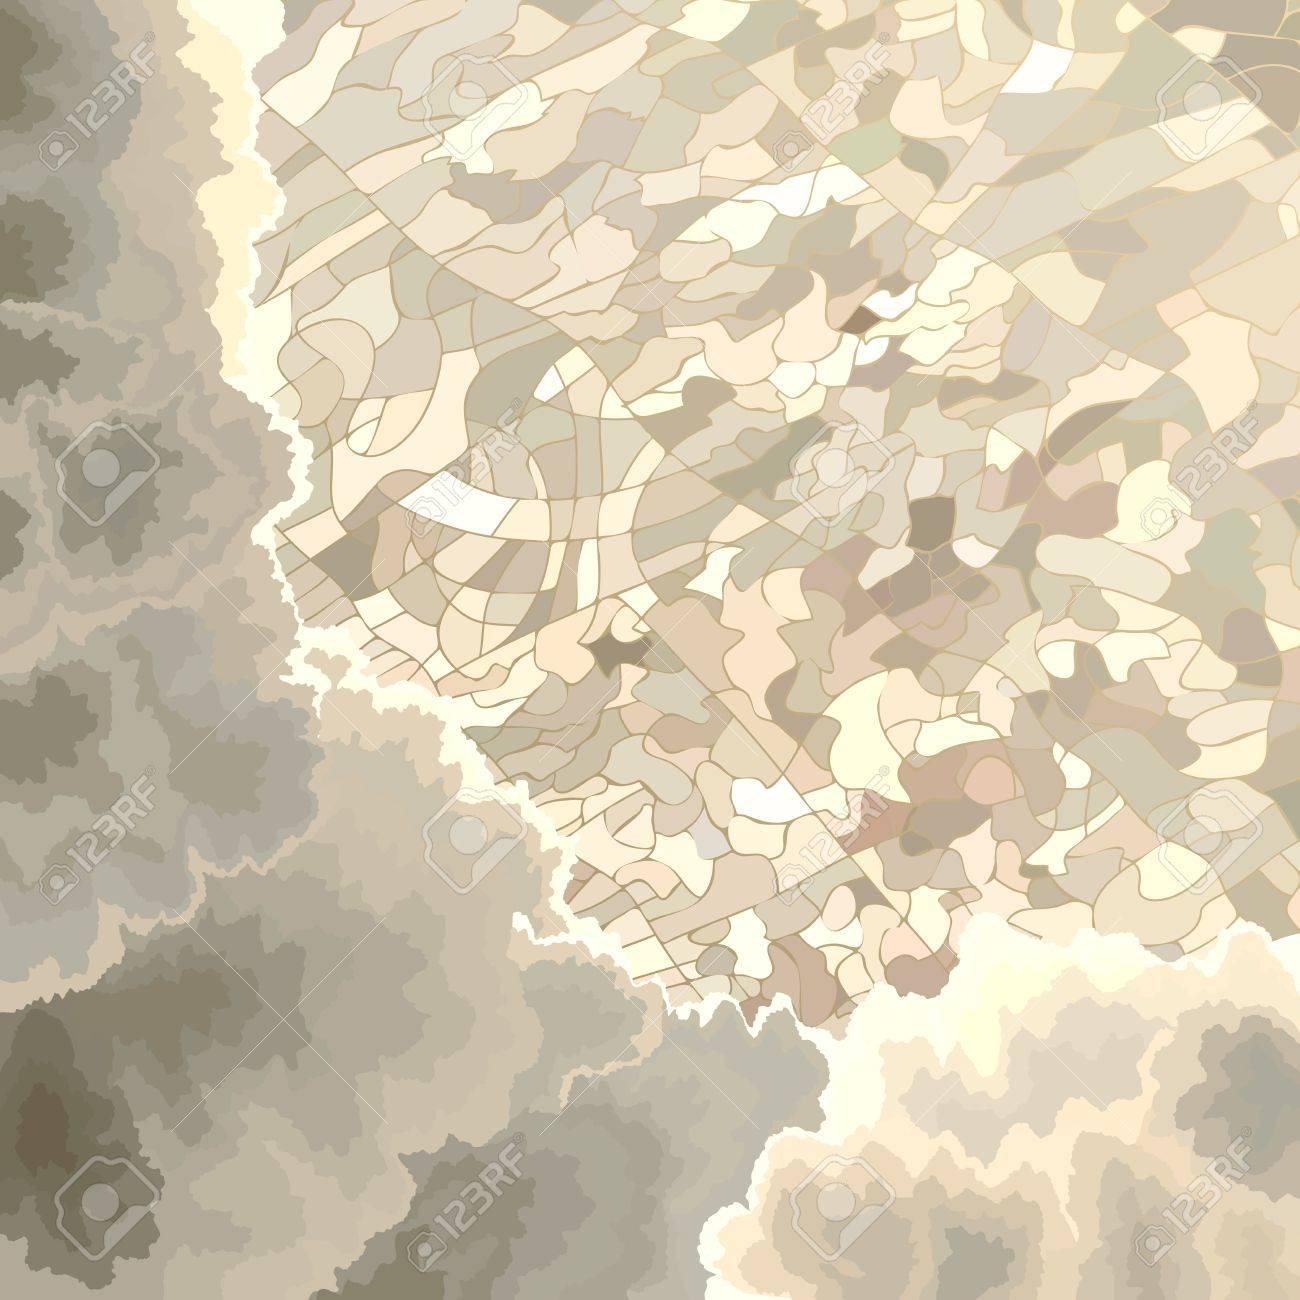 Birds Eye View Illustration Birds Eye View Cartoon